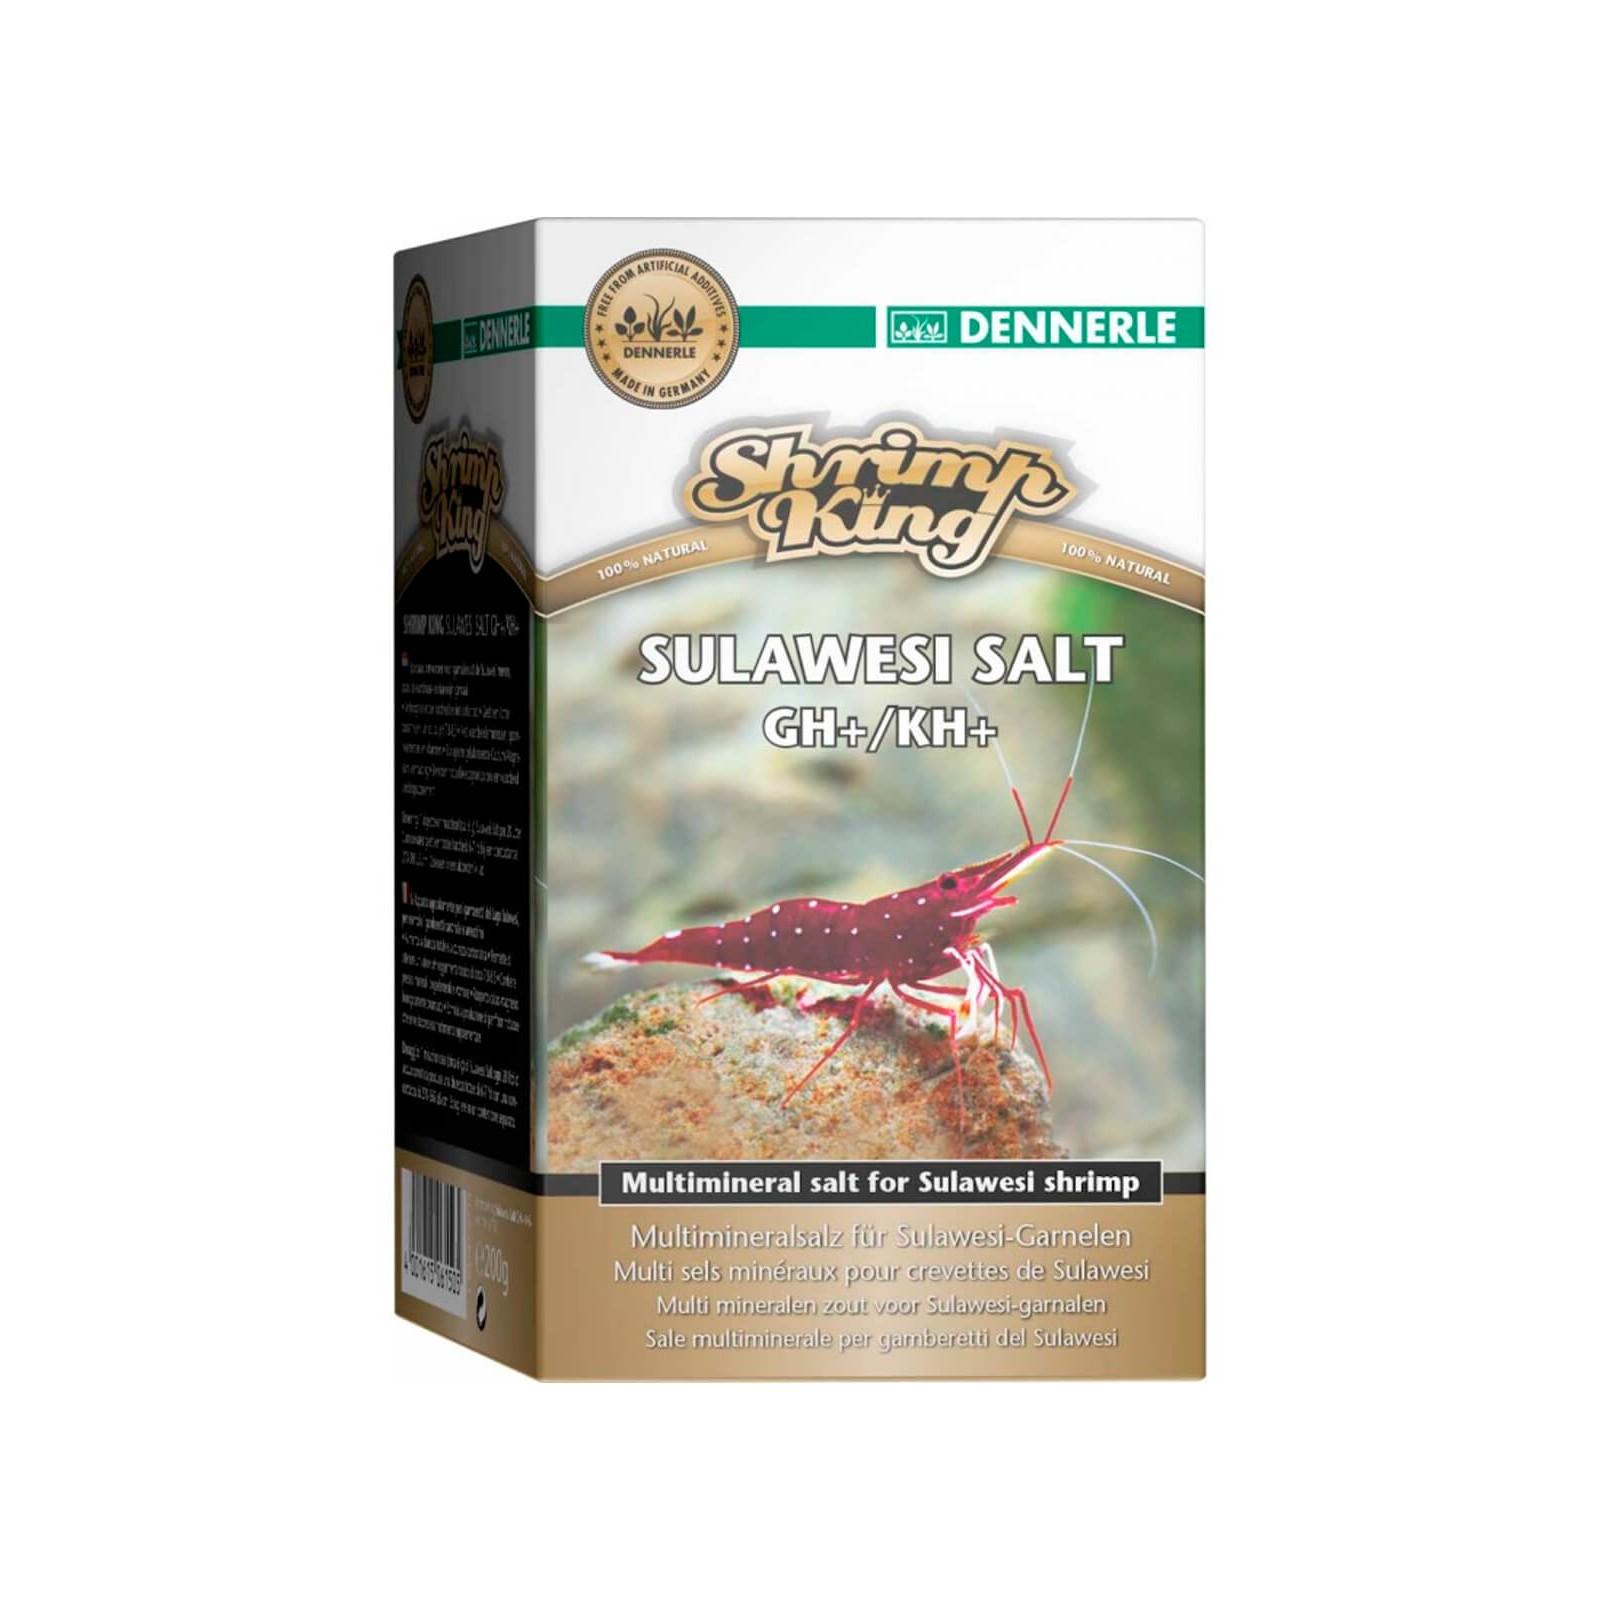 Dennerle Shrimp King Sulawesi Salt sale per Gh e Kh adatto a cardine in acquario